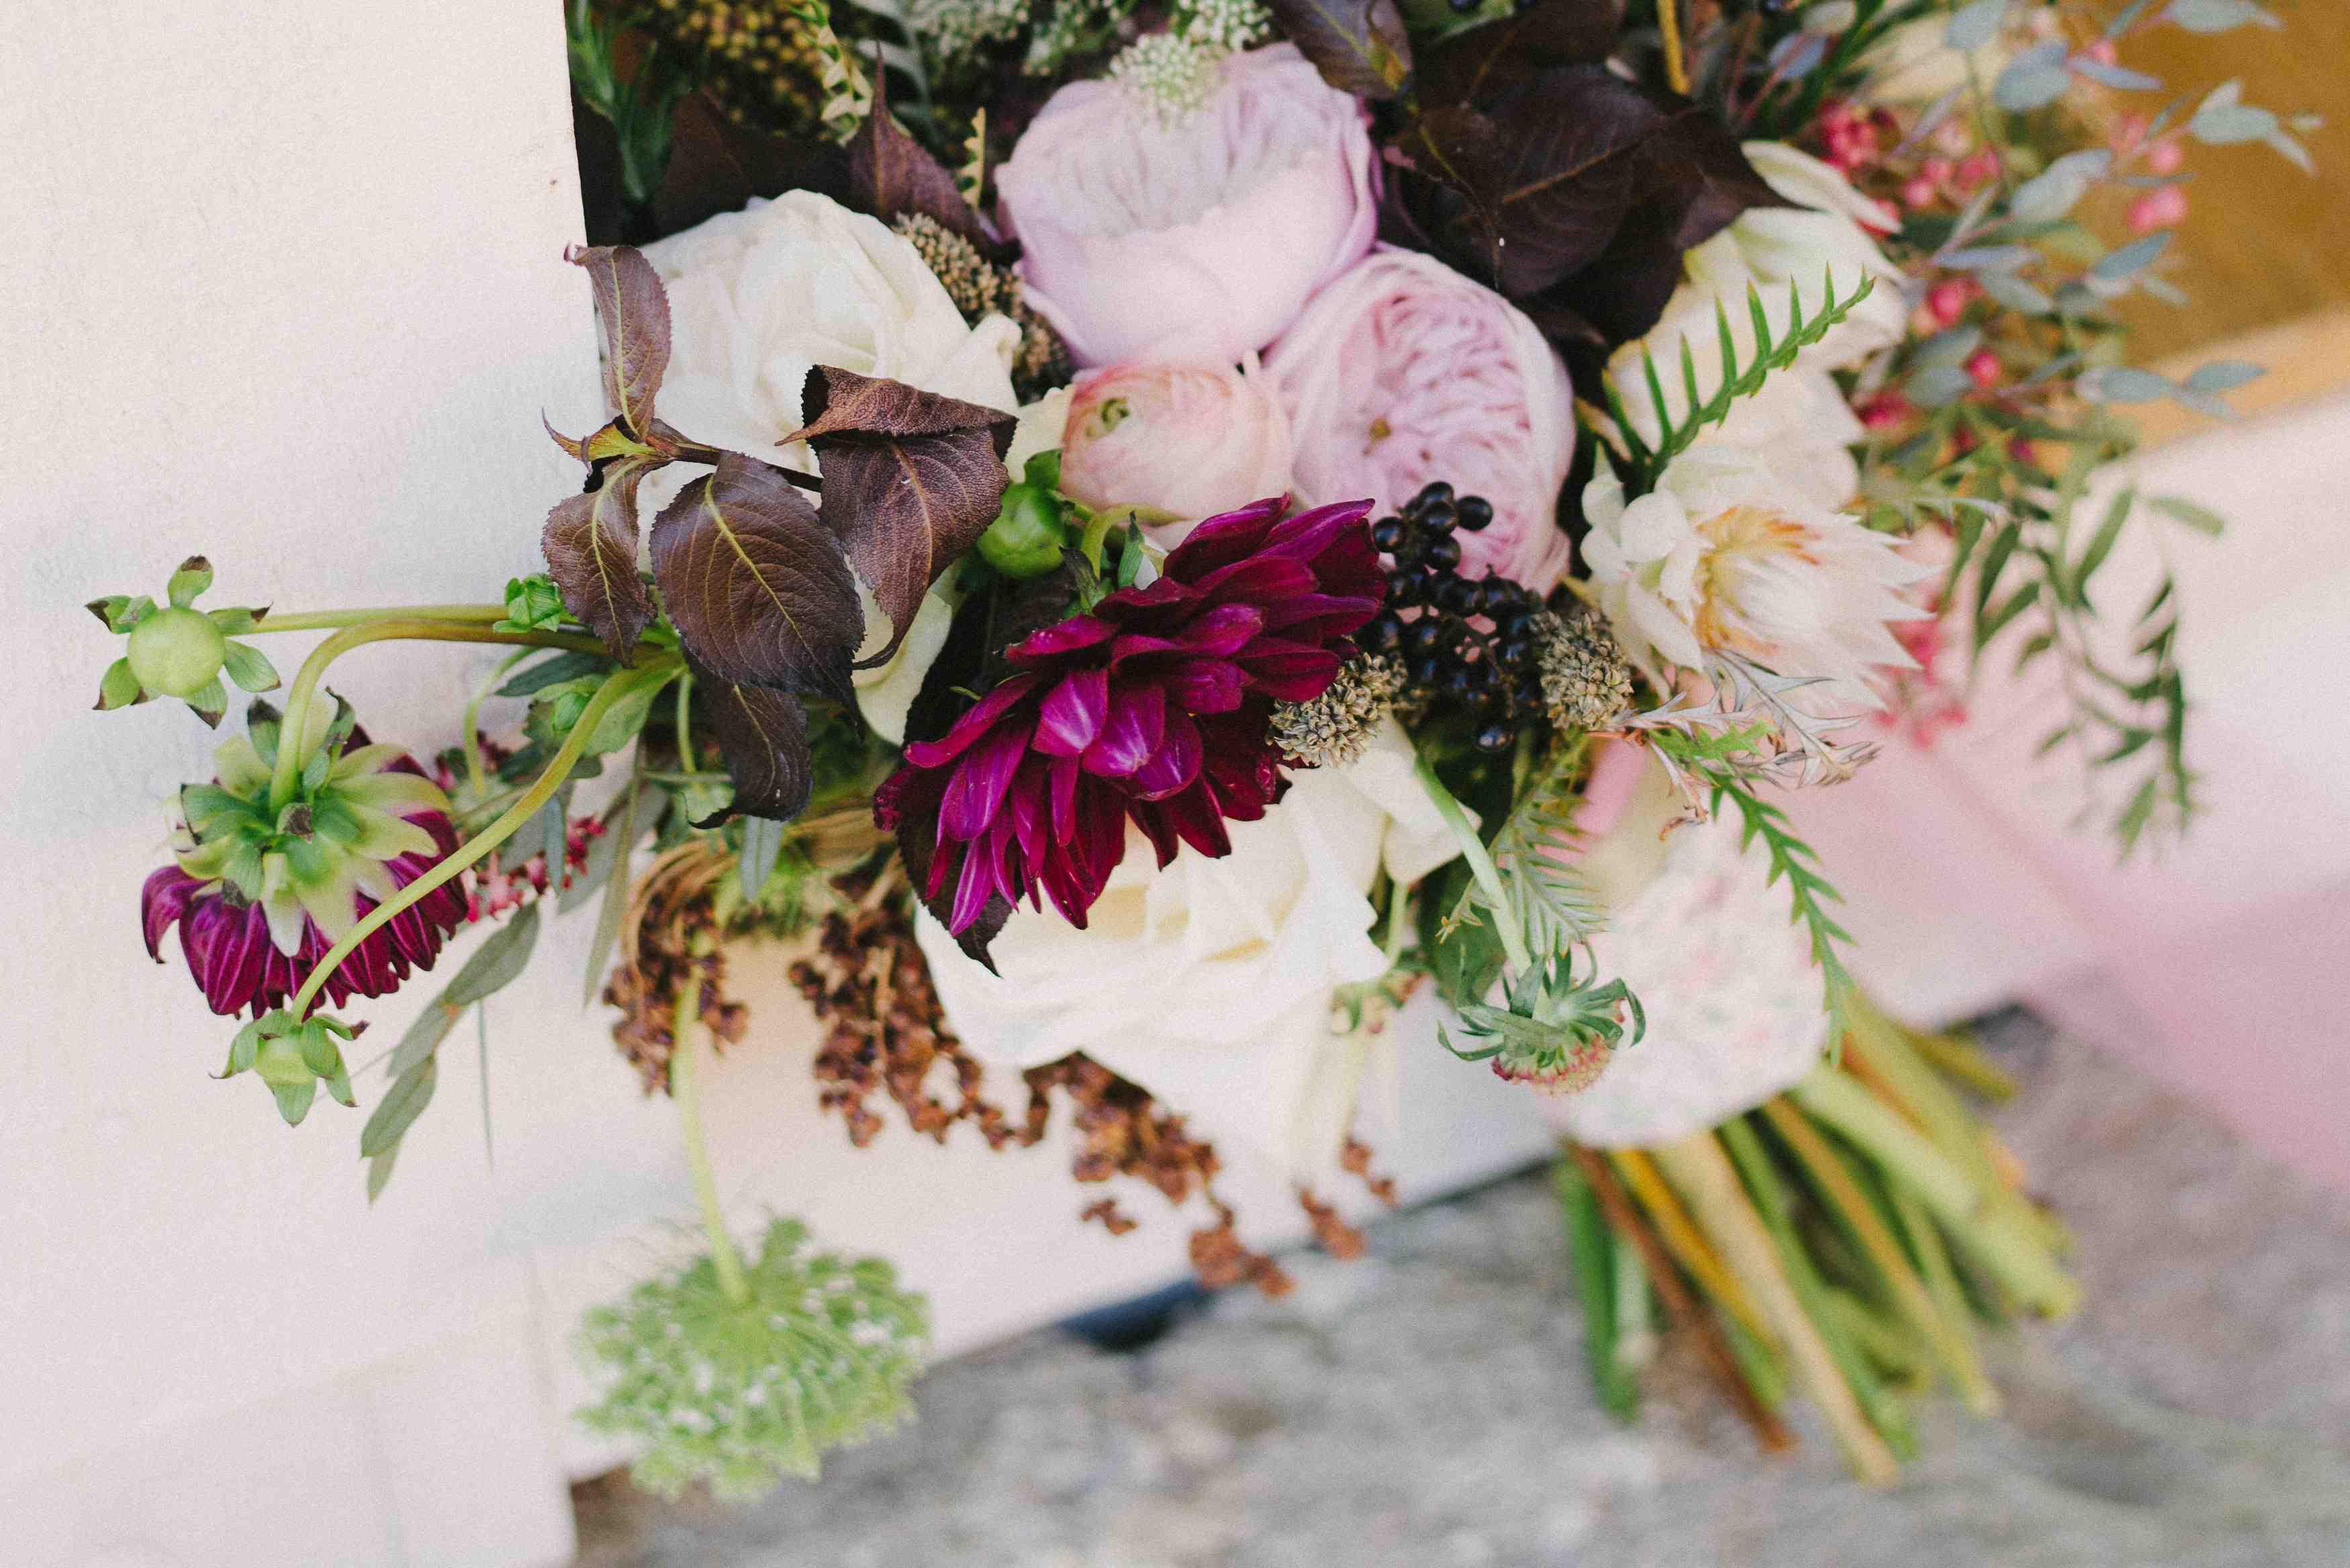 Kitz farm lotus floral designs 603 491 4063 gorgeous wedding photo lindsay hackney photography dhlflorist Image collections